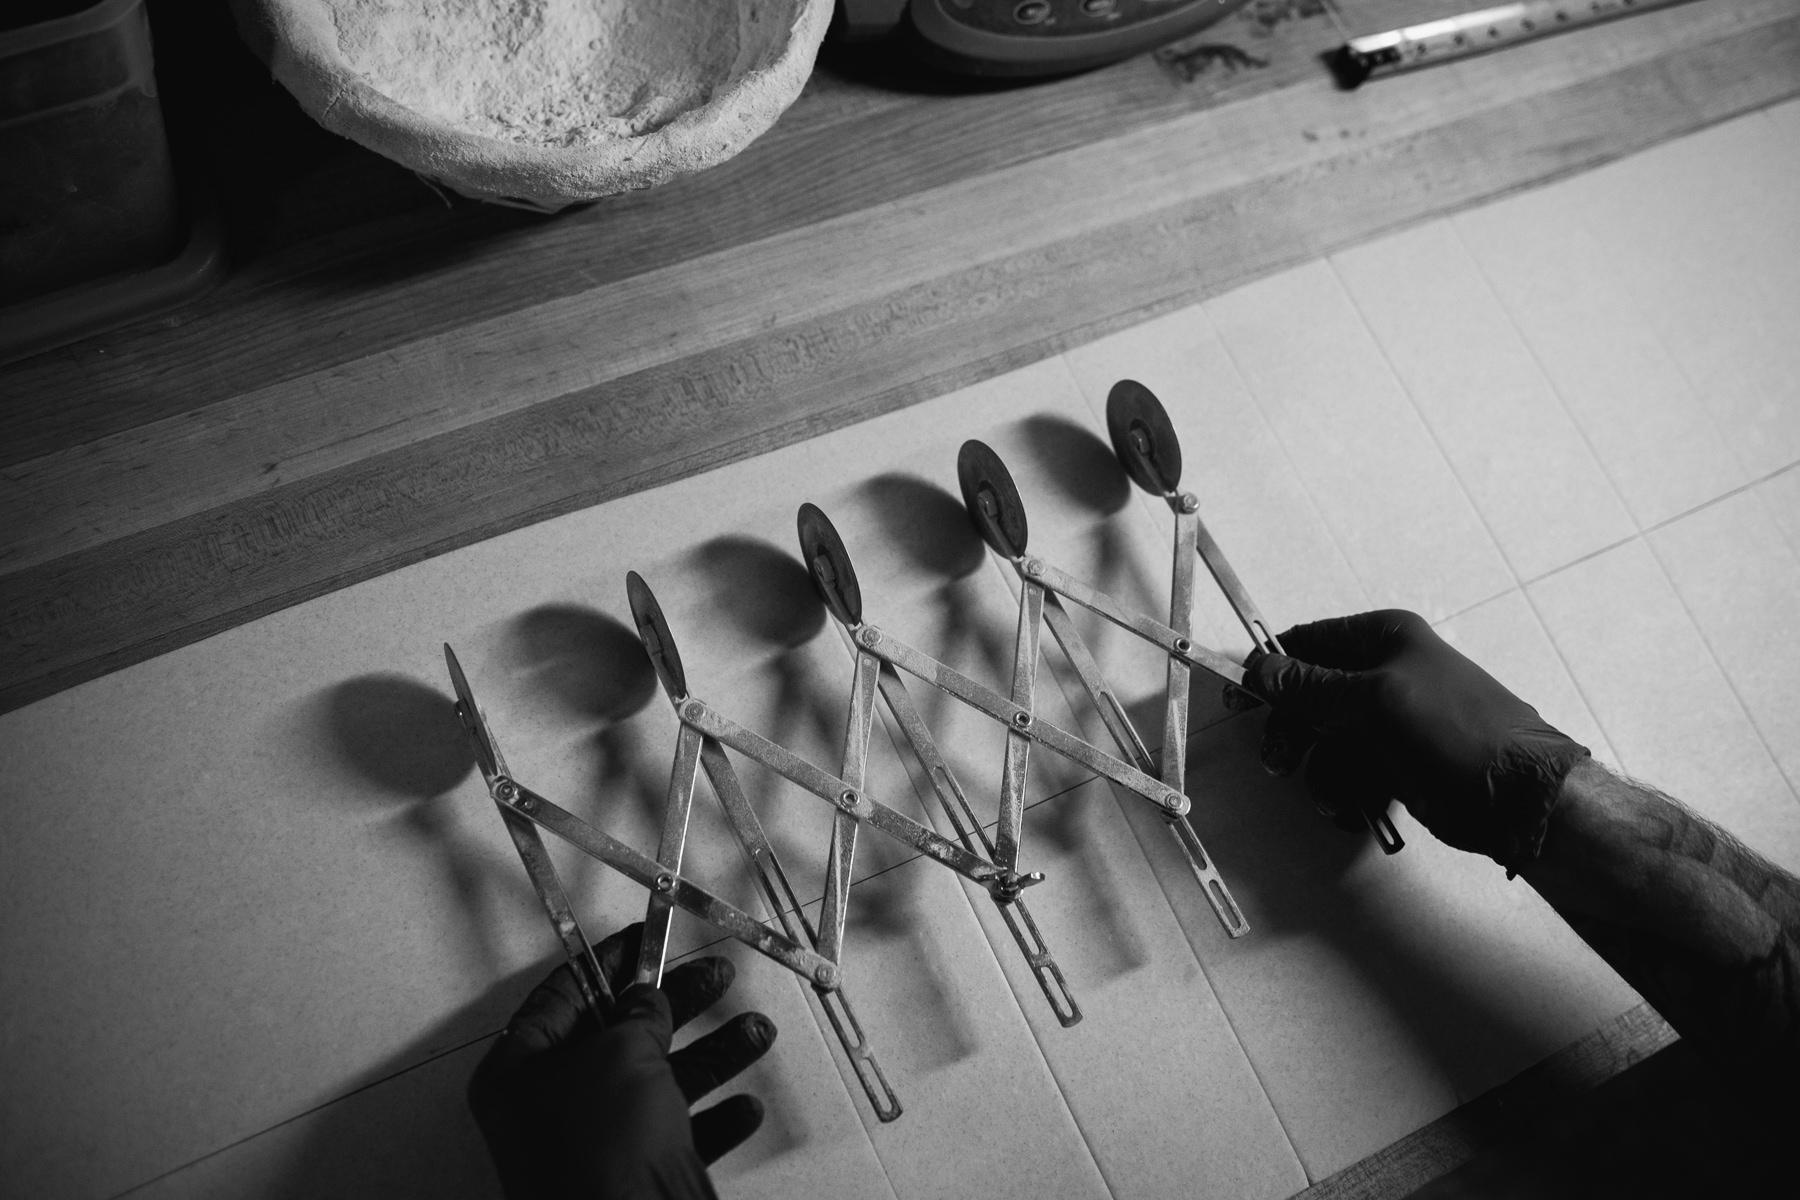 matt-tinder-saboteur-bakery-bremerton-wa-9